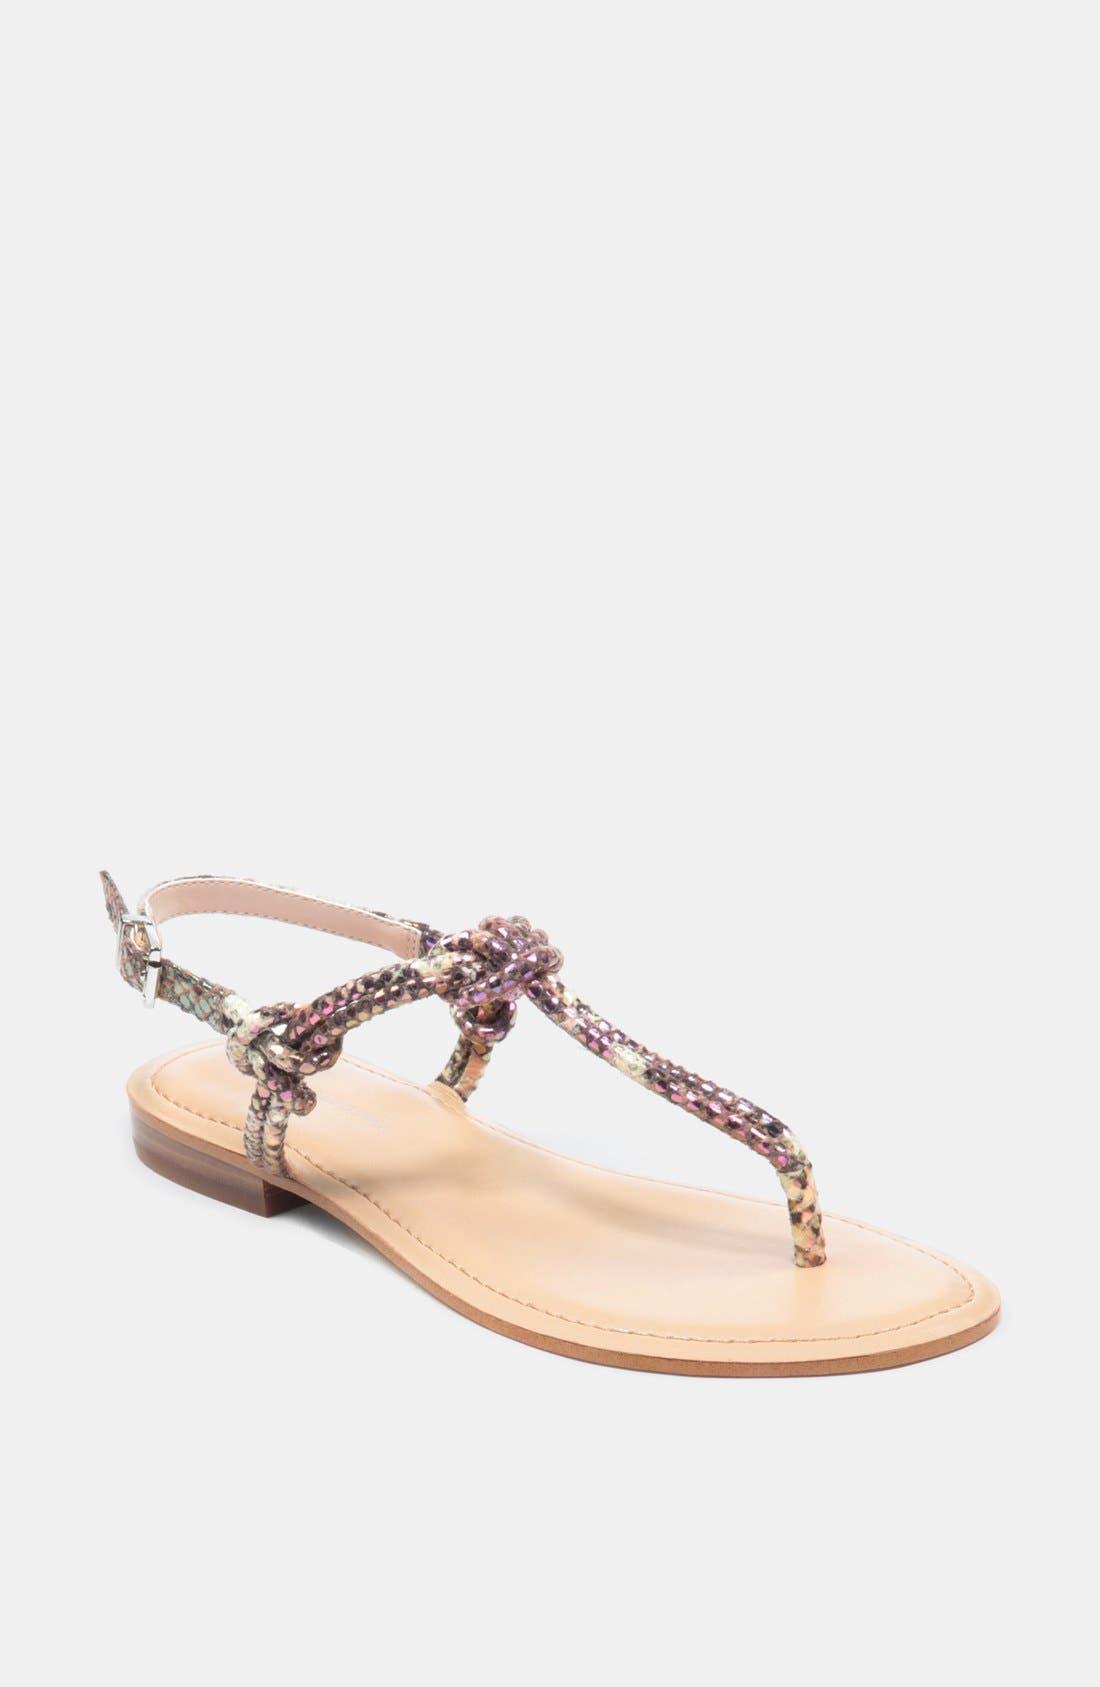 Alternate Image 1 Selected - BCBGeneration 'Bavia' Sandal